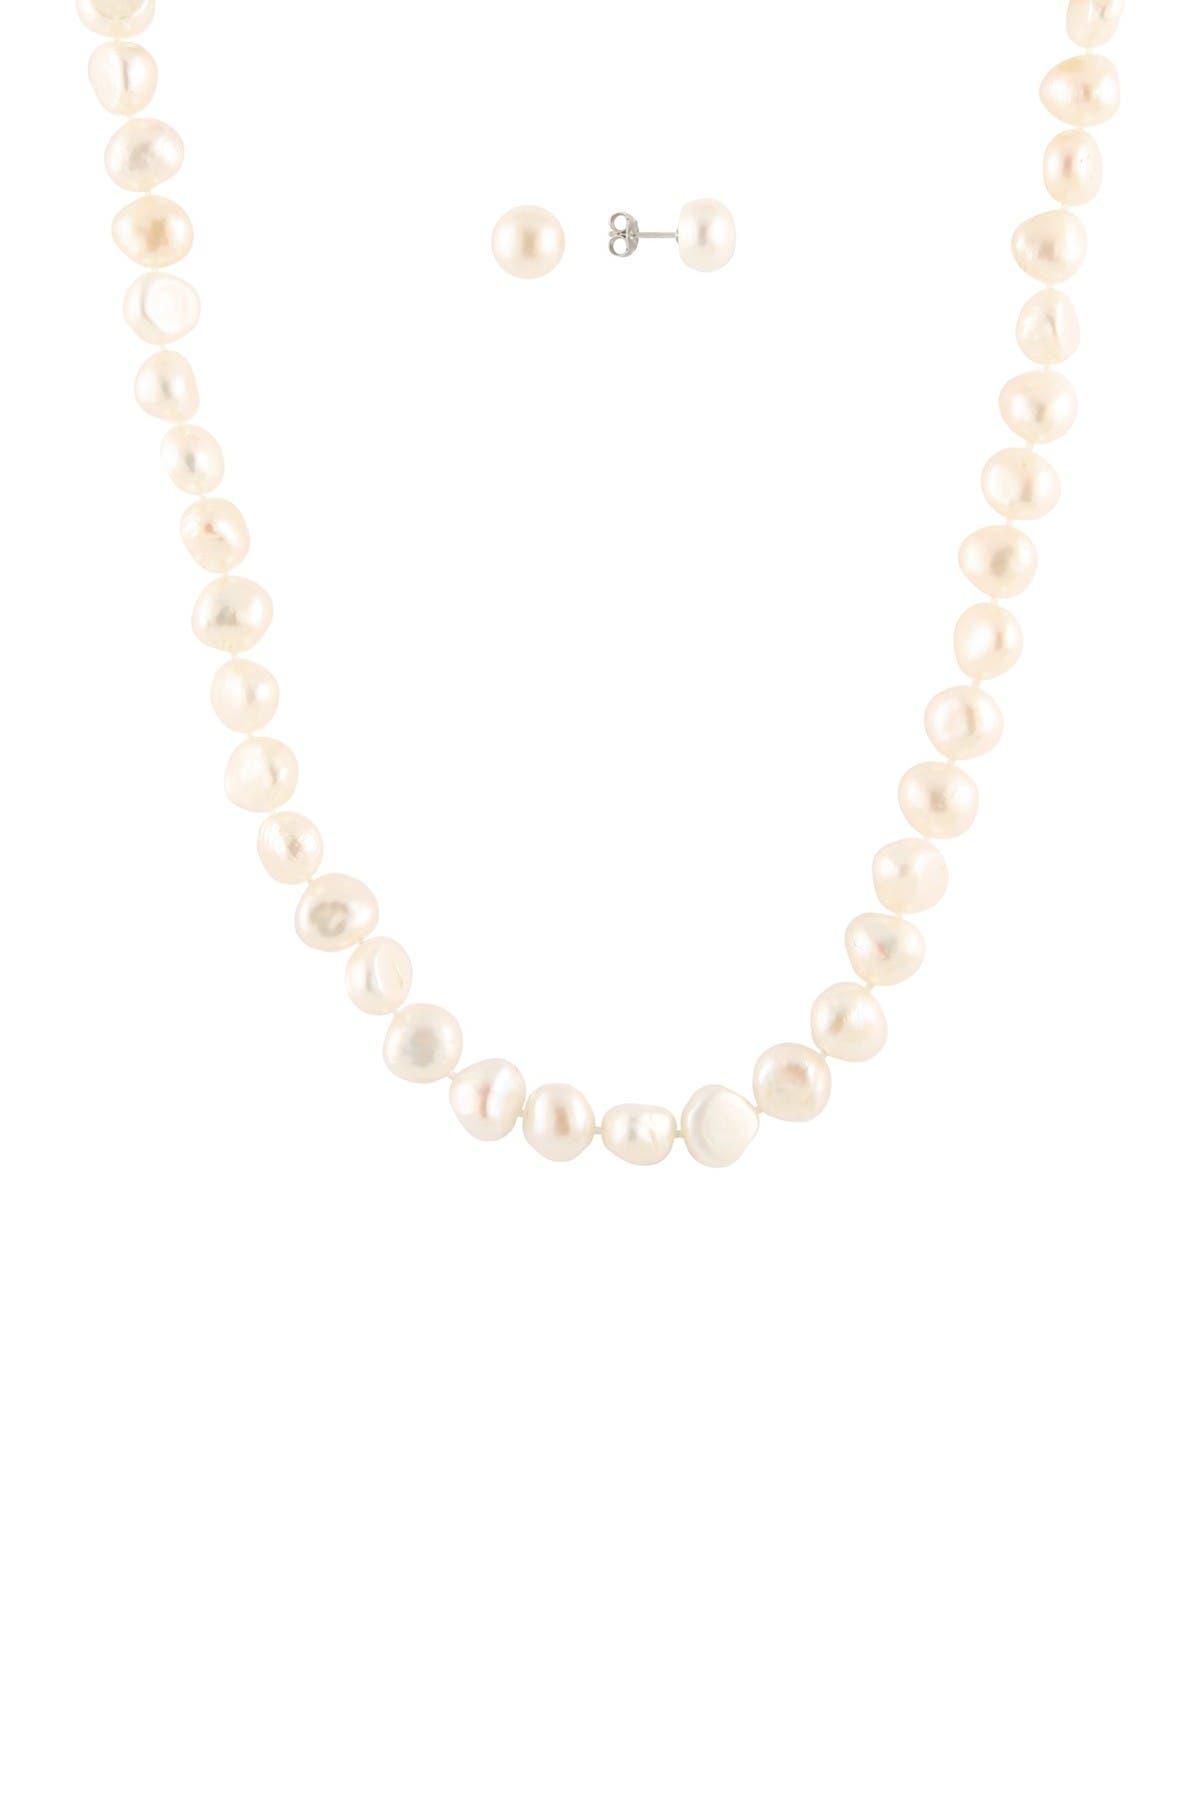 Splendid Pearls Sterling Silver 2-Piece 8-9mm Freshwater Pearl Necklace & Stud Earrings Set